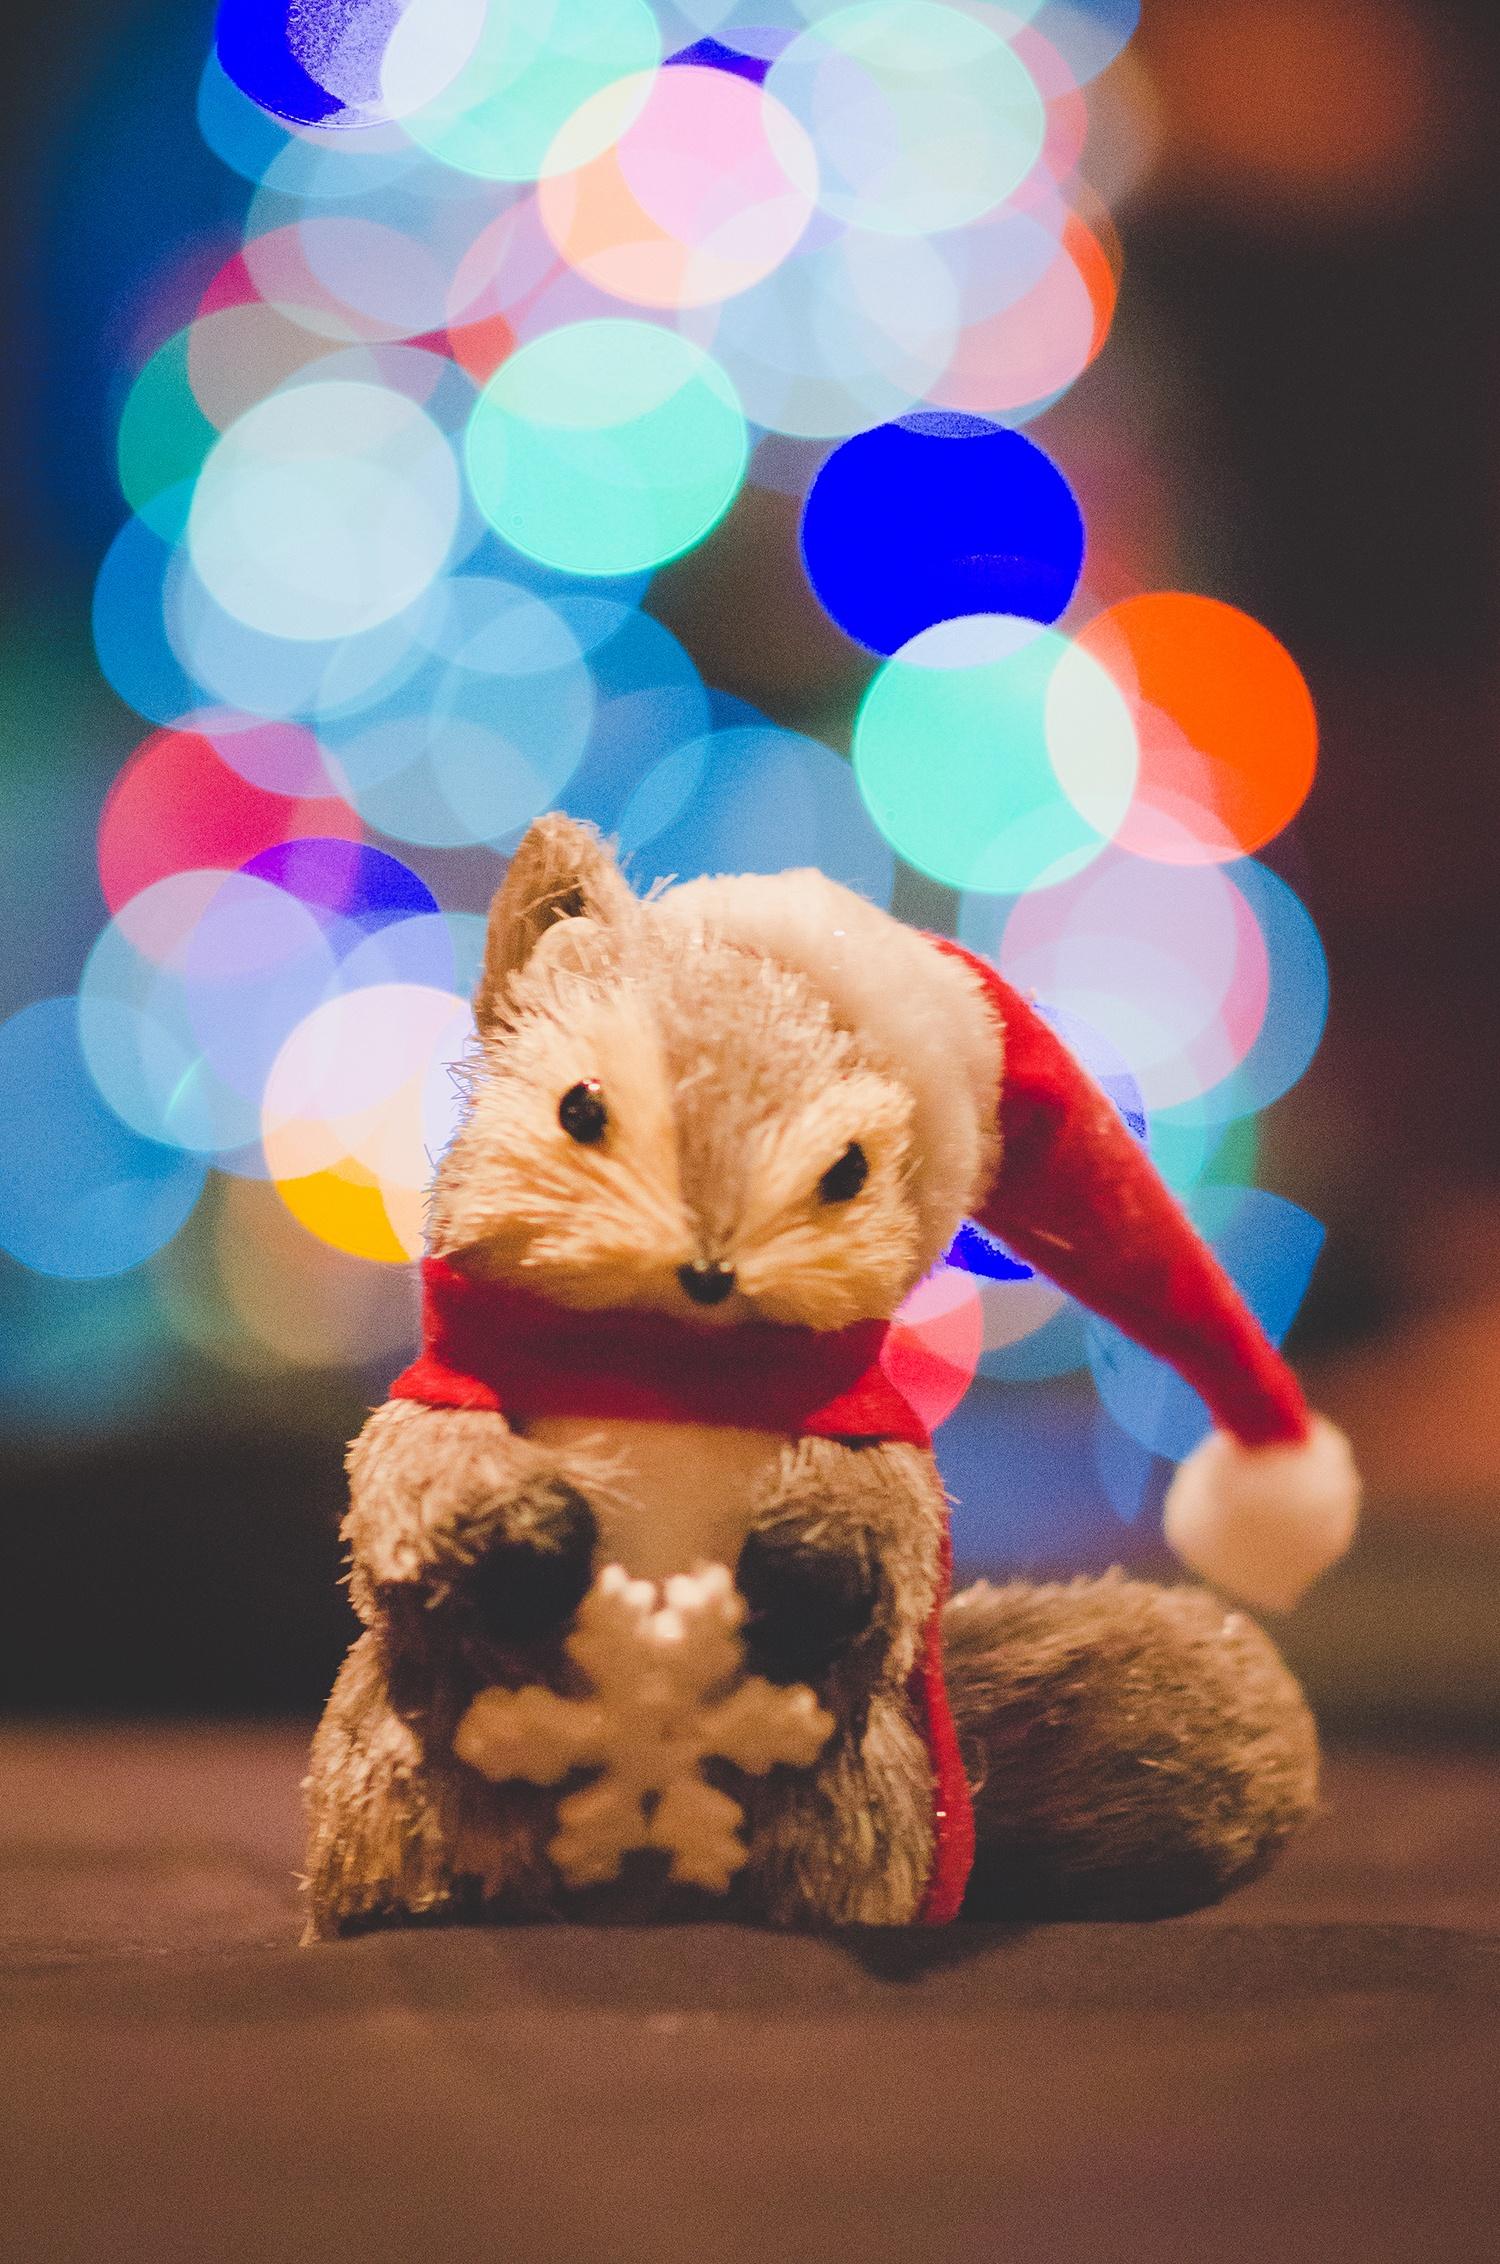 Squirrels Holiday 2016